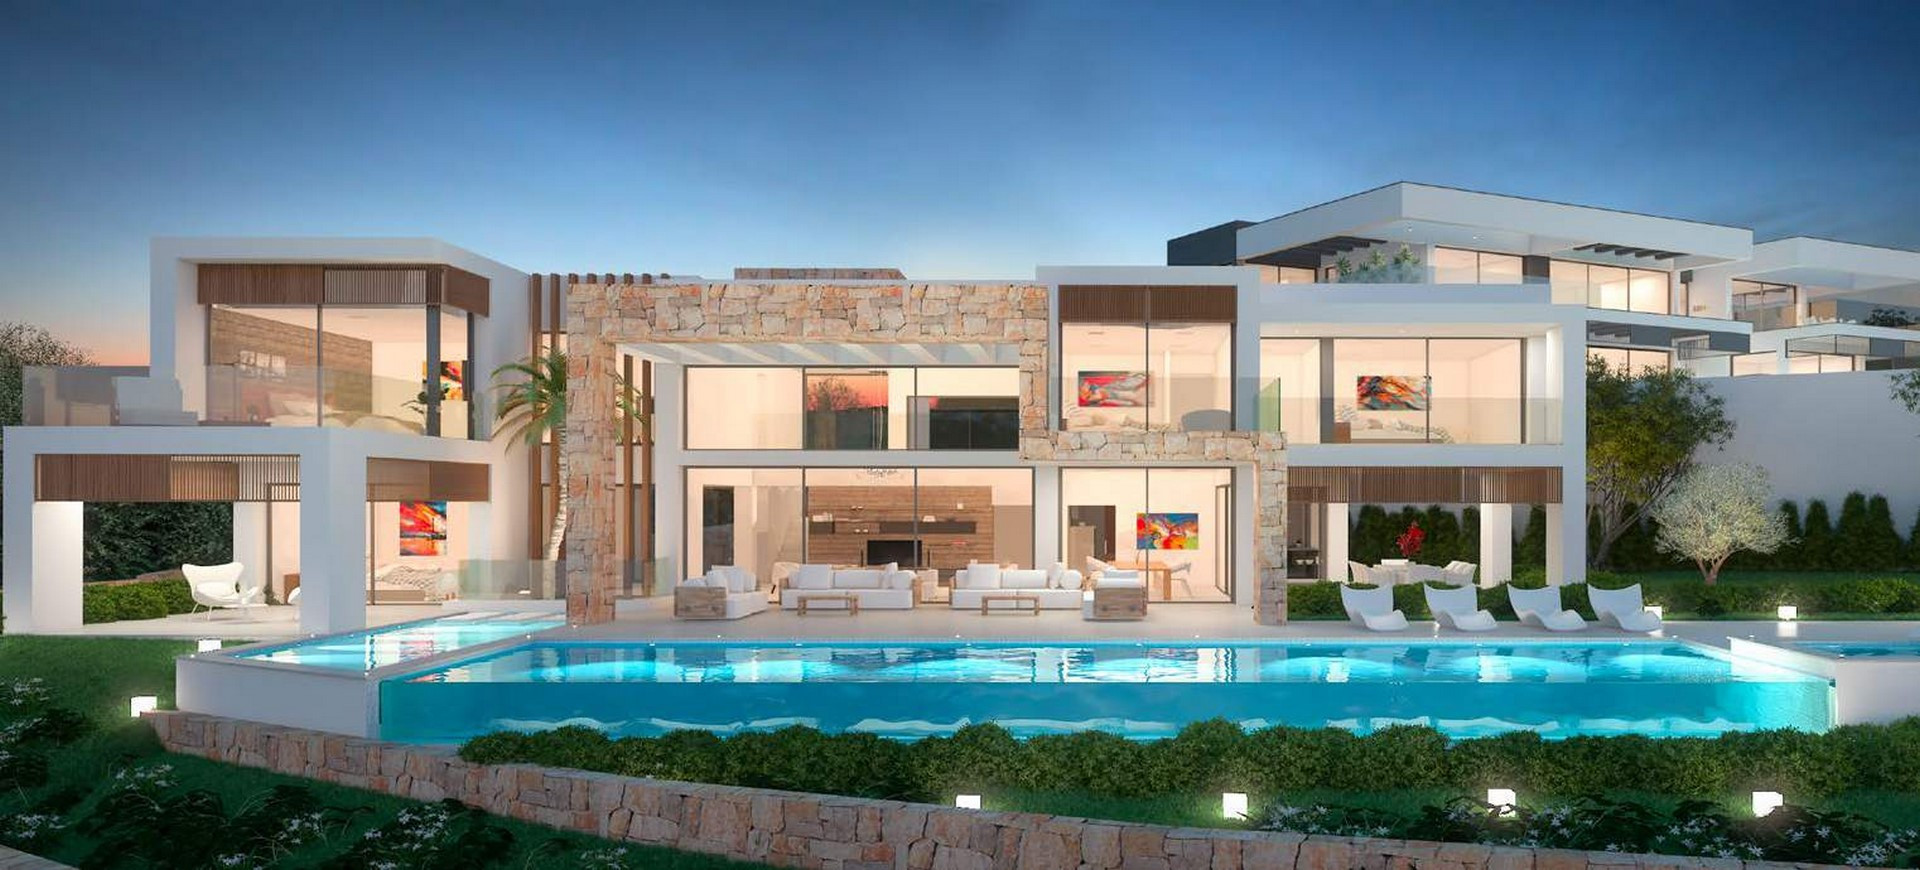 ARFV1982 - Modern Neubauvilla  zu verkaufen in La Cerquilla in  Nueva Andalucia